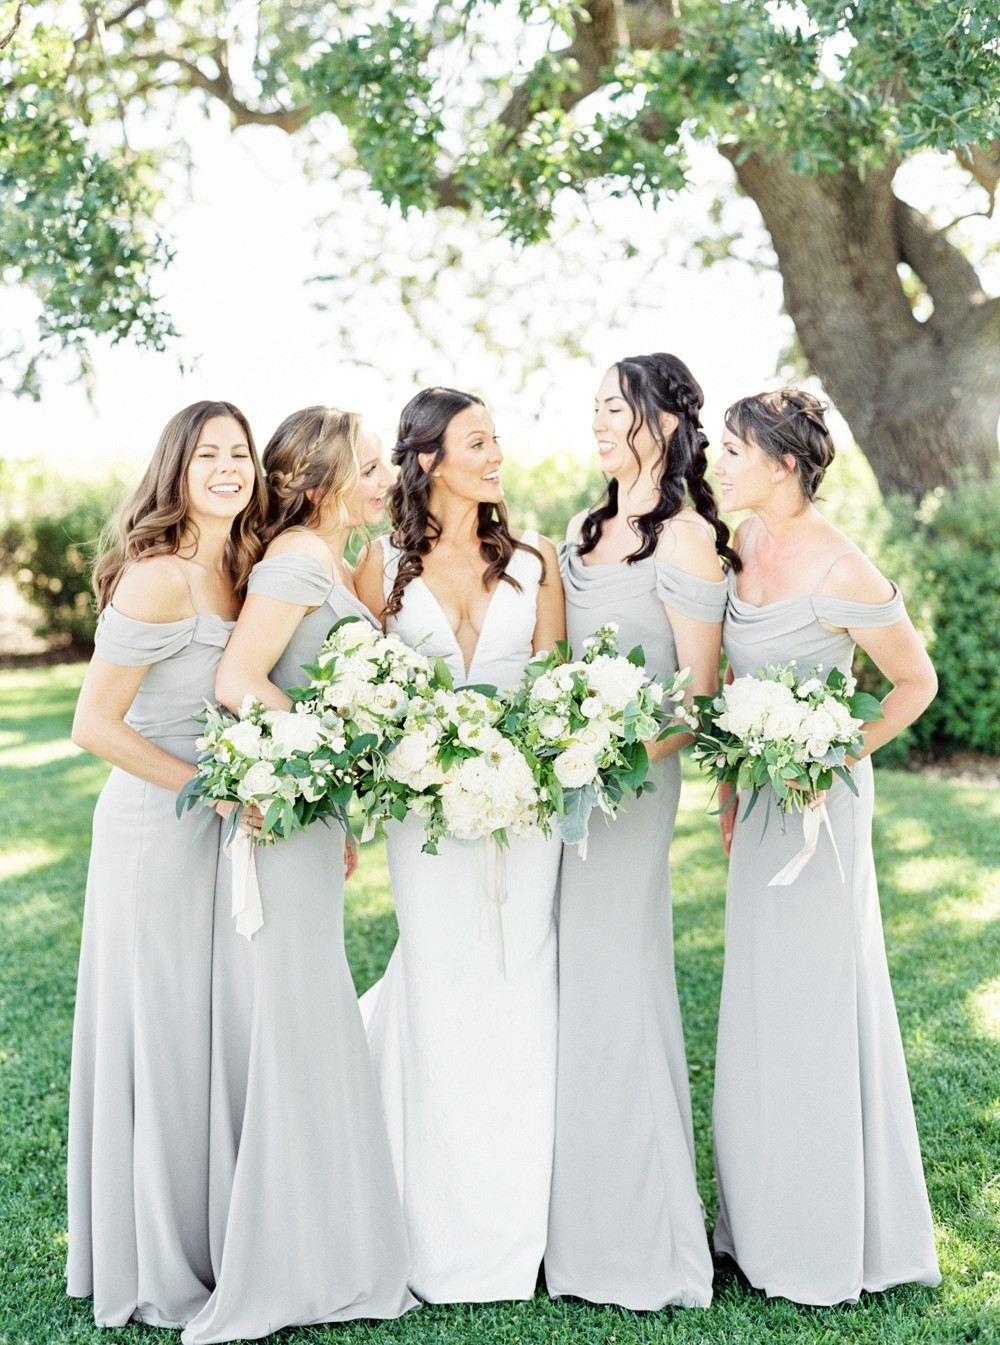 A Grey Outdoor Wedding in Santa Ynez